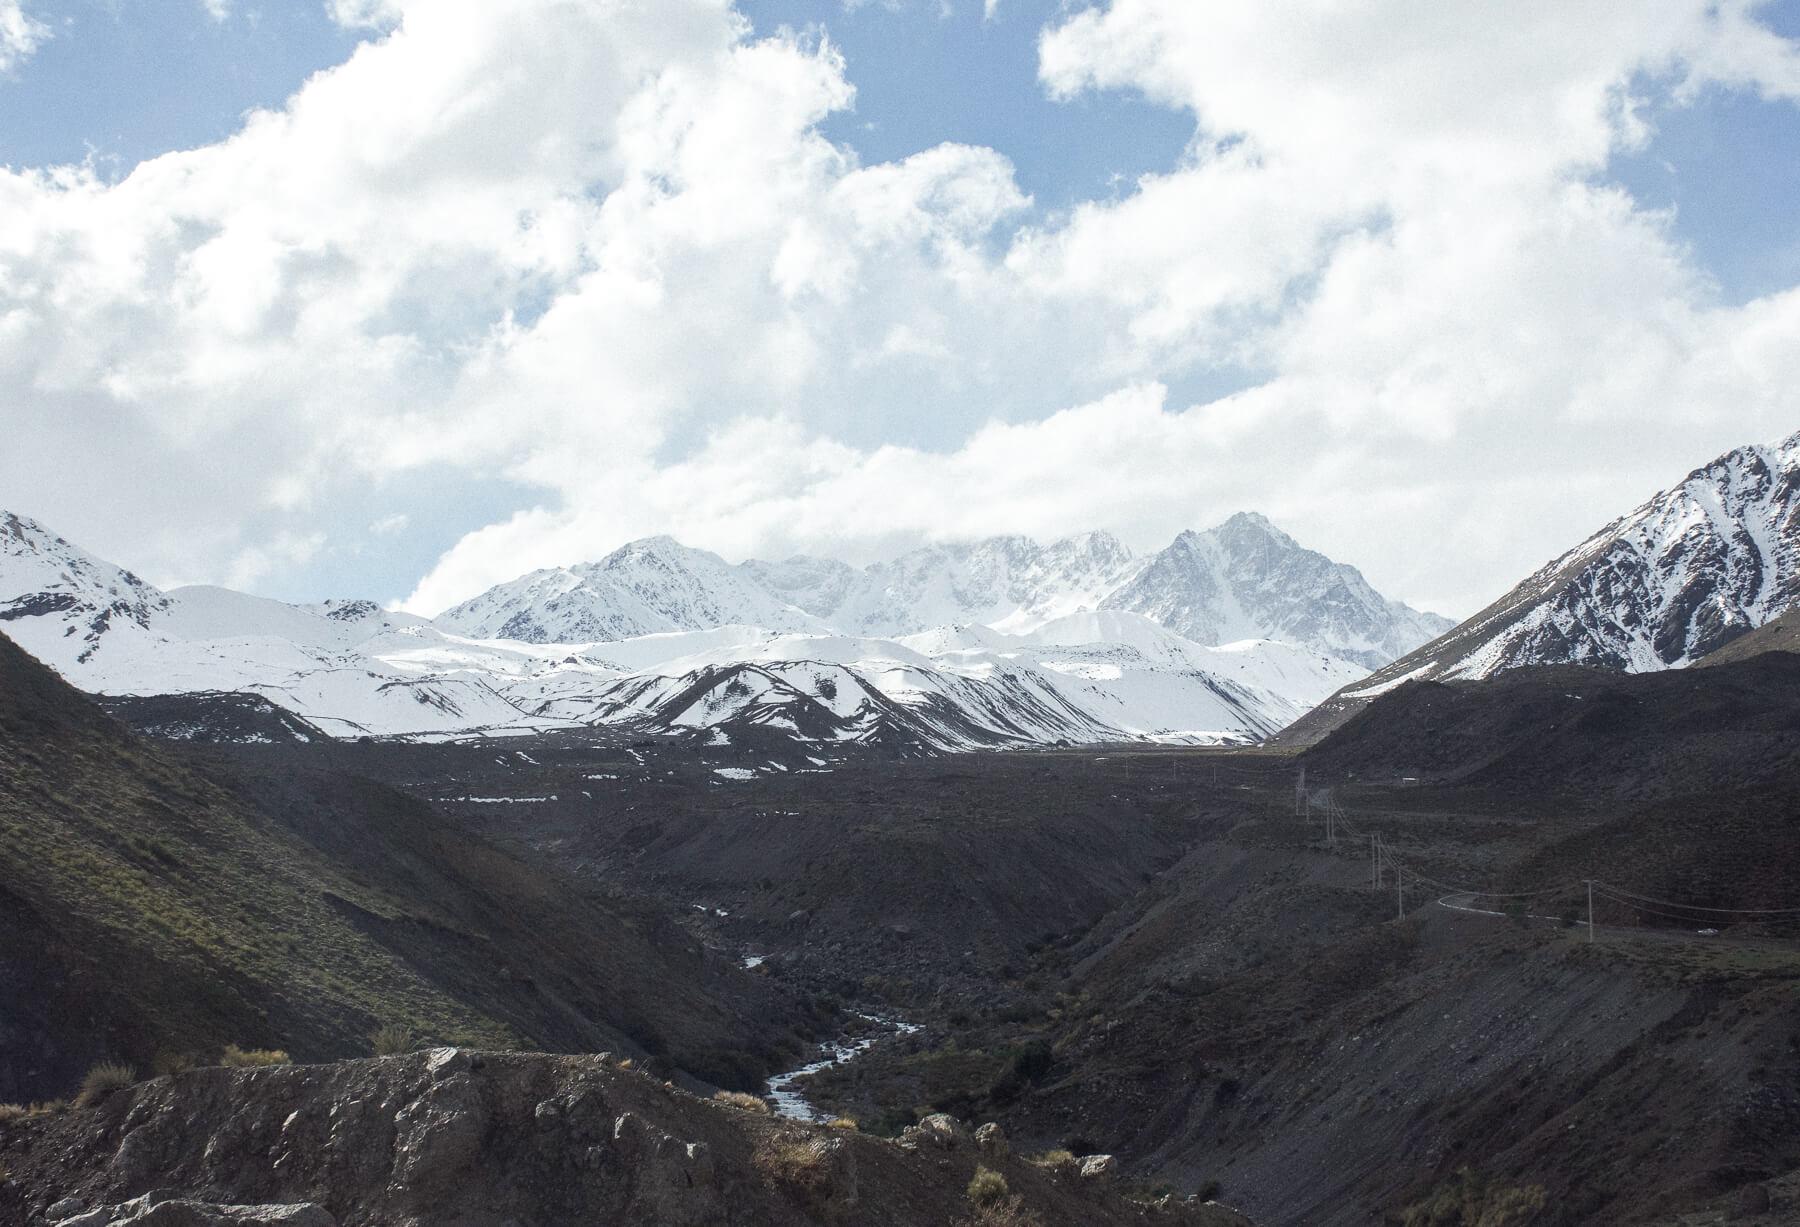 Valley in-between big mountain peaks